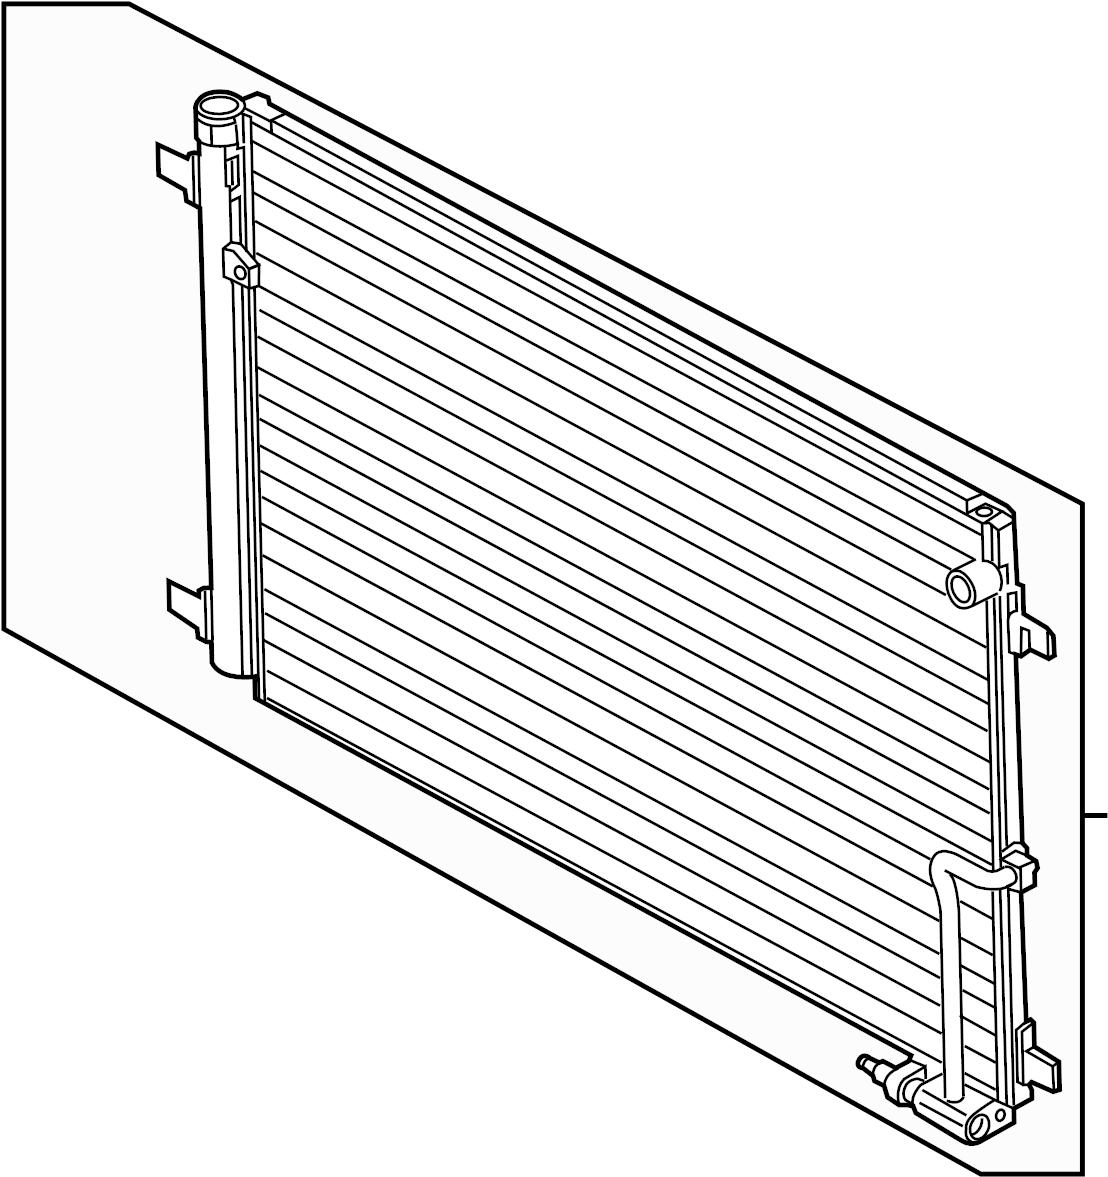 Ac Condenser Serial Number